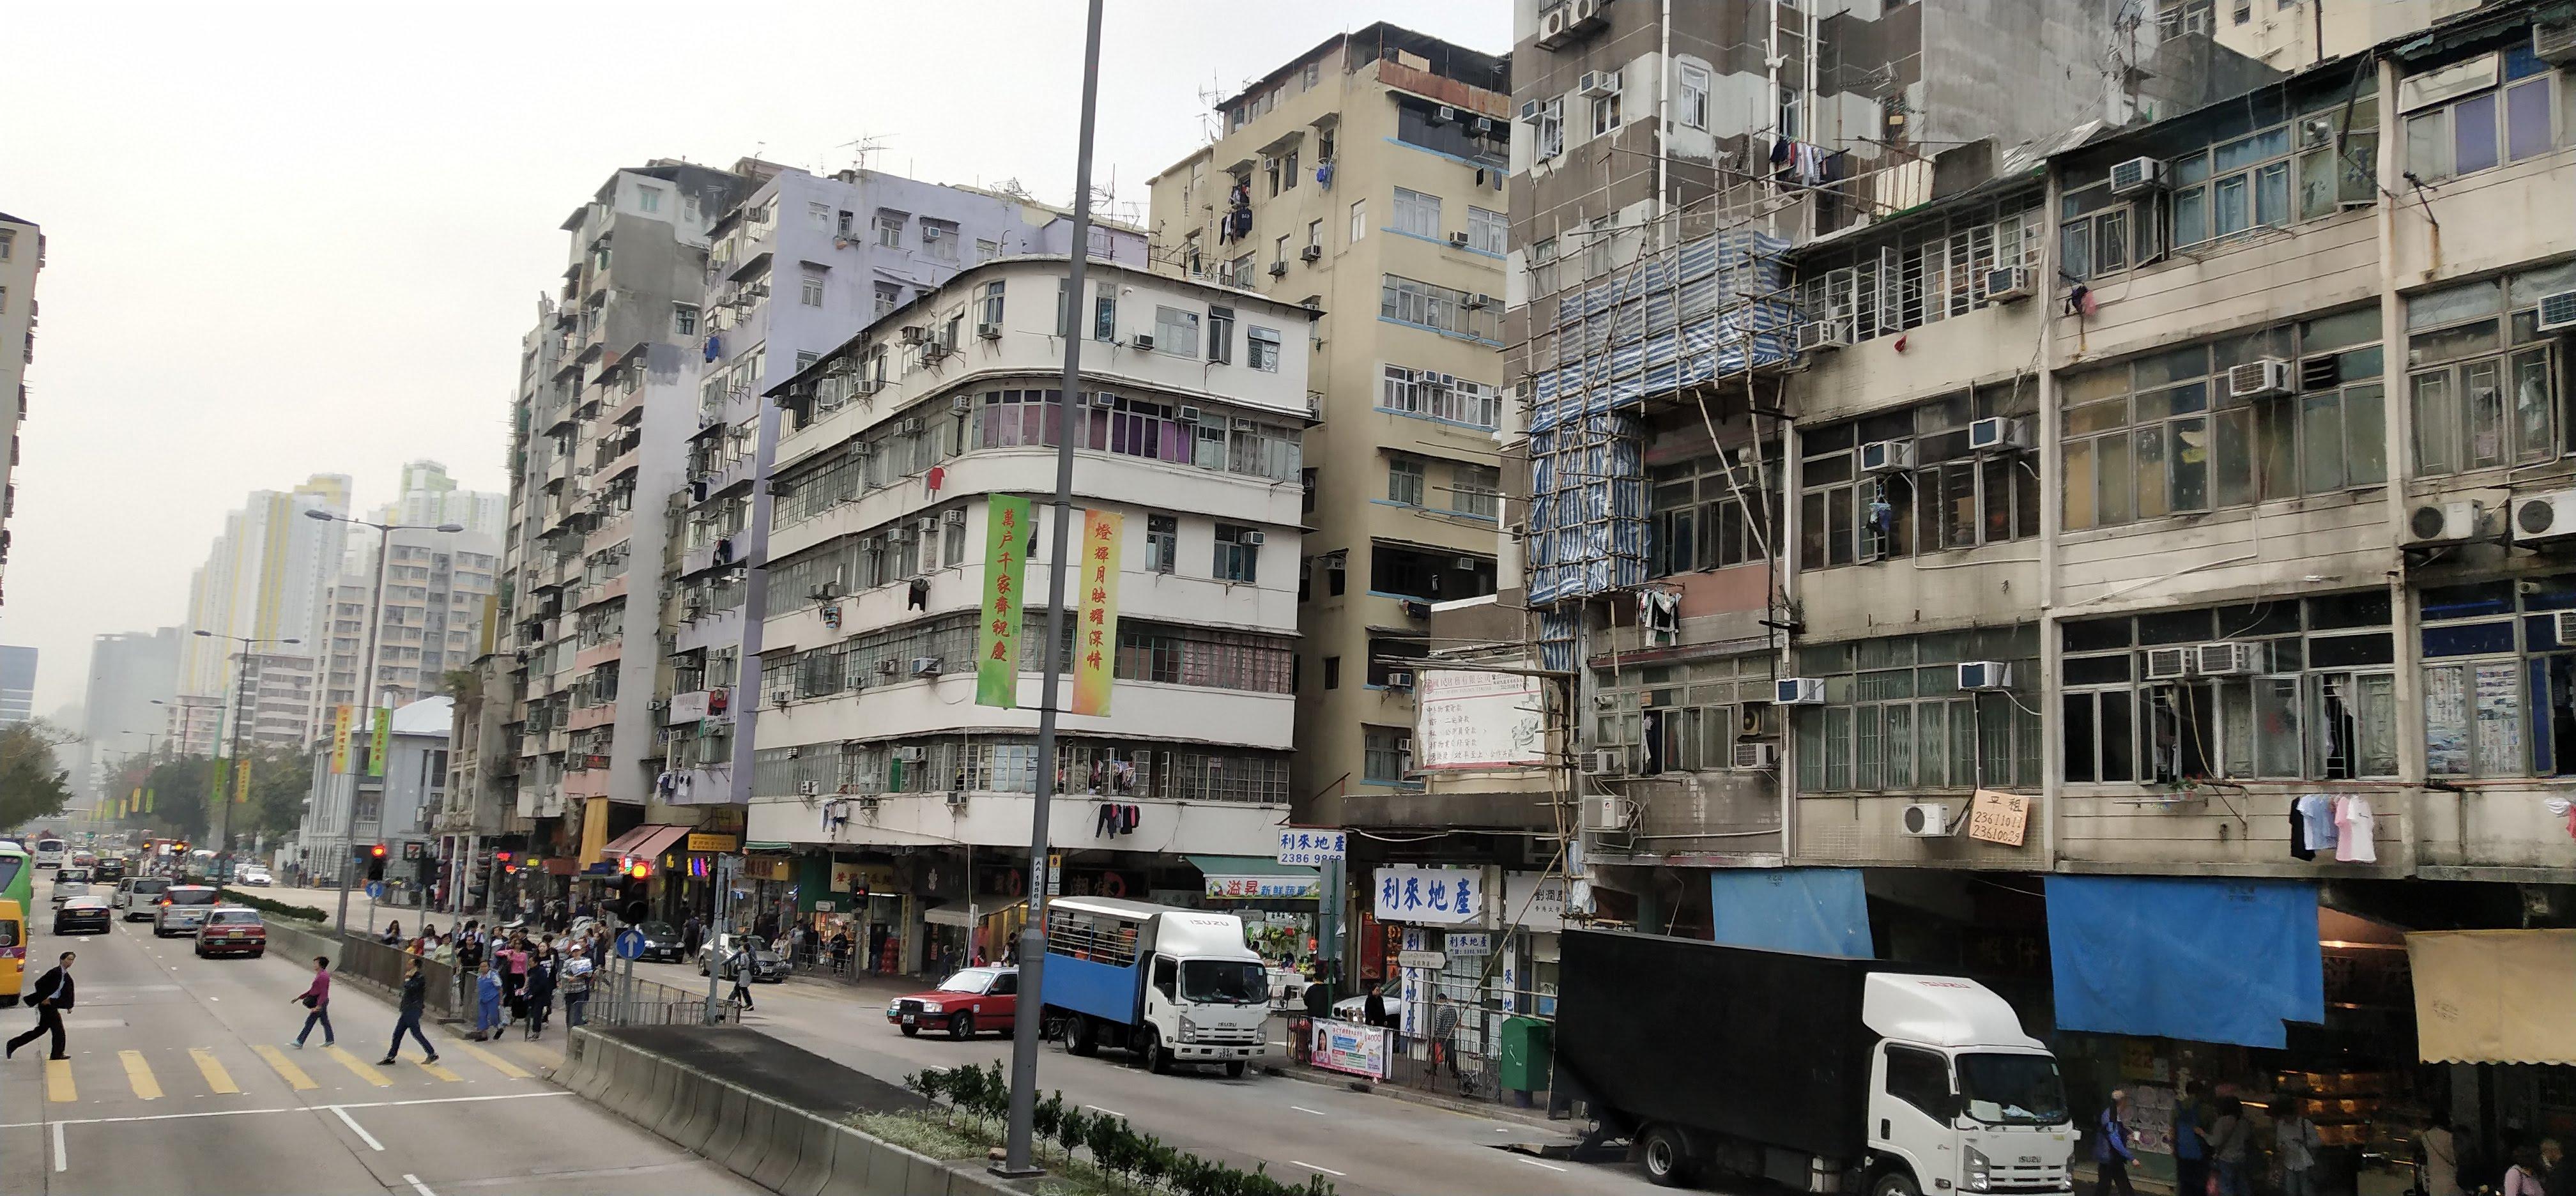 Old tenement buildings on Lai Chi Kok Road